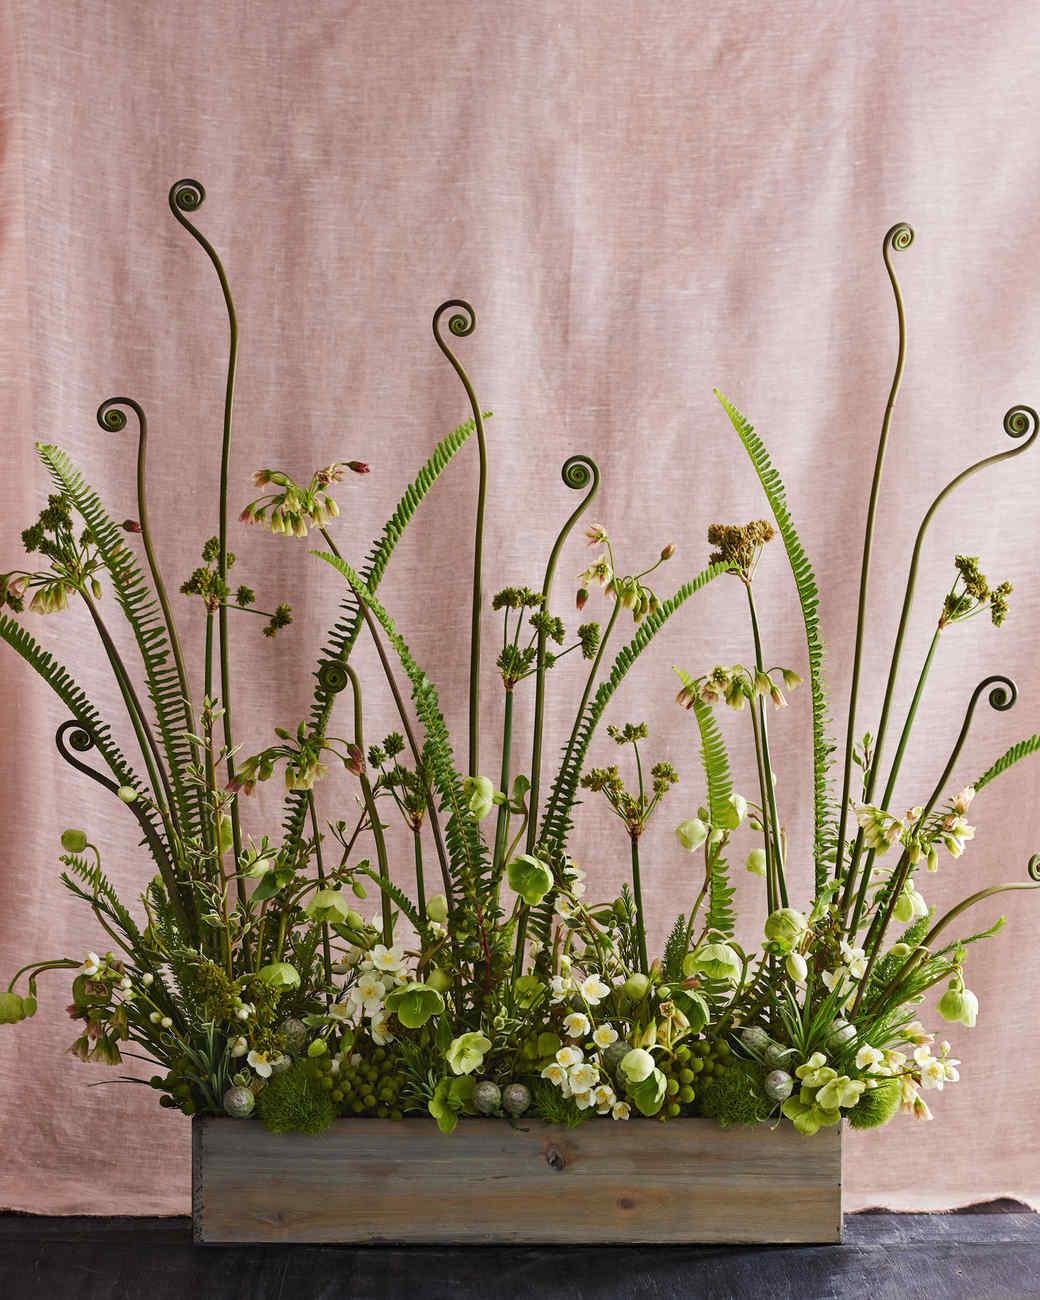 dandelion-ranch-clover-chadwick-woodland-187r-flat-d112251.jpg